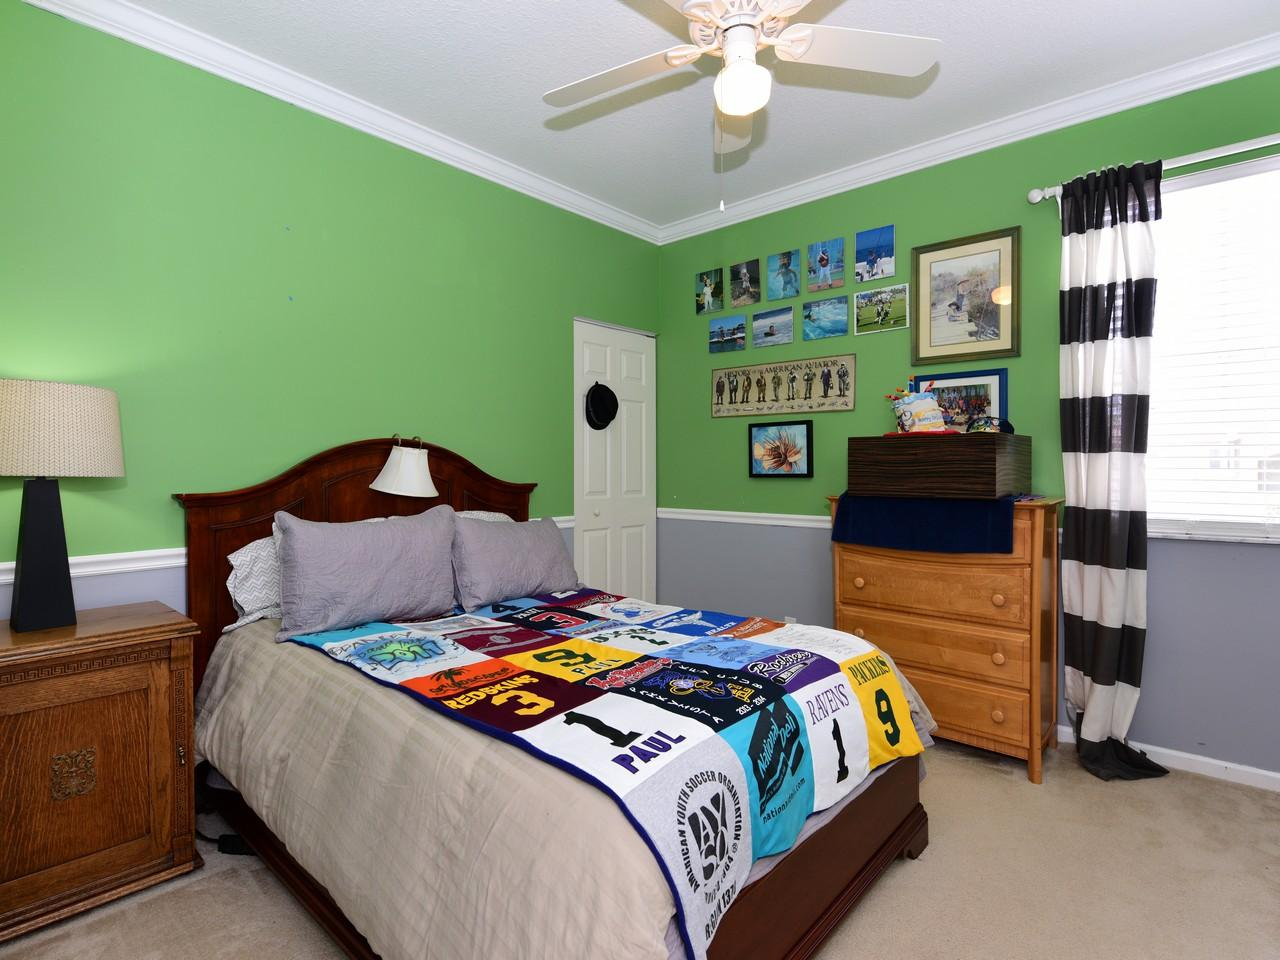 6752 Kaleb Way, Lake Worth, Florida 33467, 4 Bedrooms Bedrooms, ,3 BathroomsBathrooms,Single Family,For Sale,Kaleb,RX-10441571